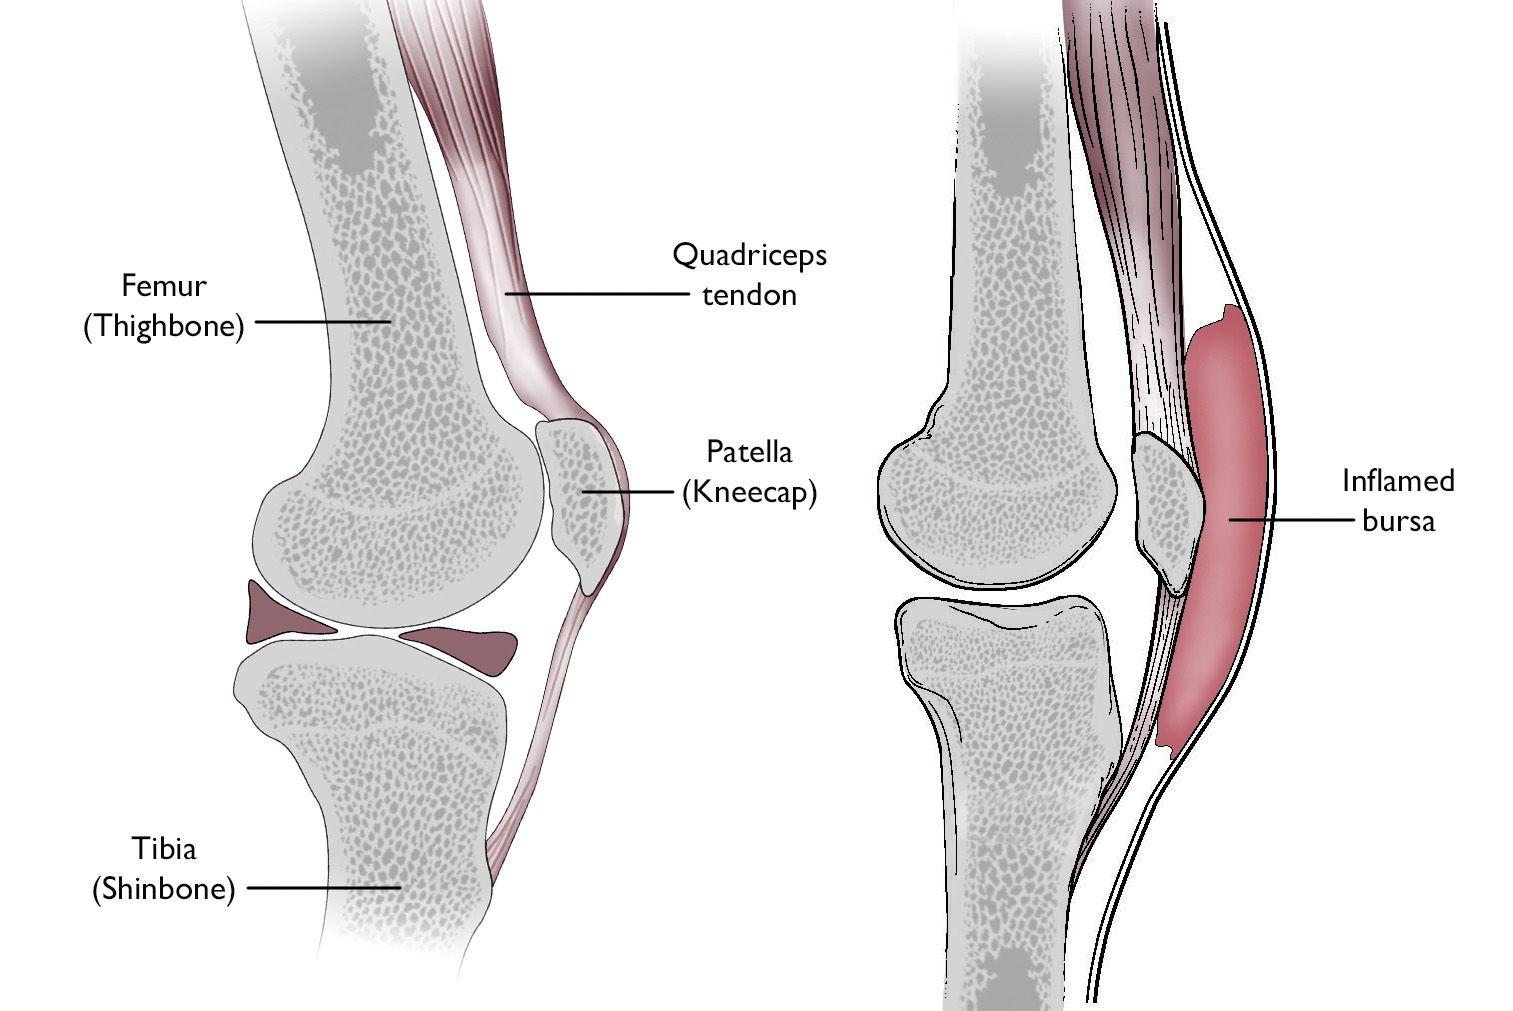 hight resolution of normal knee anatomy including the bursa involved in prepatellar bursitis